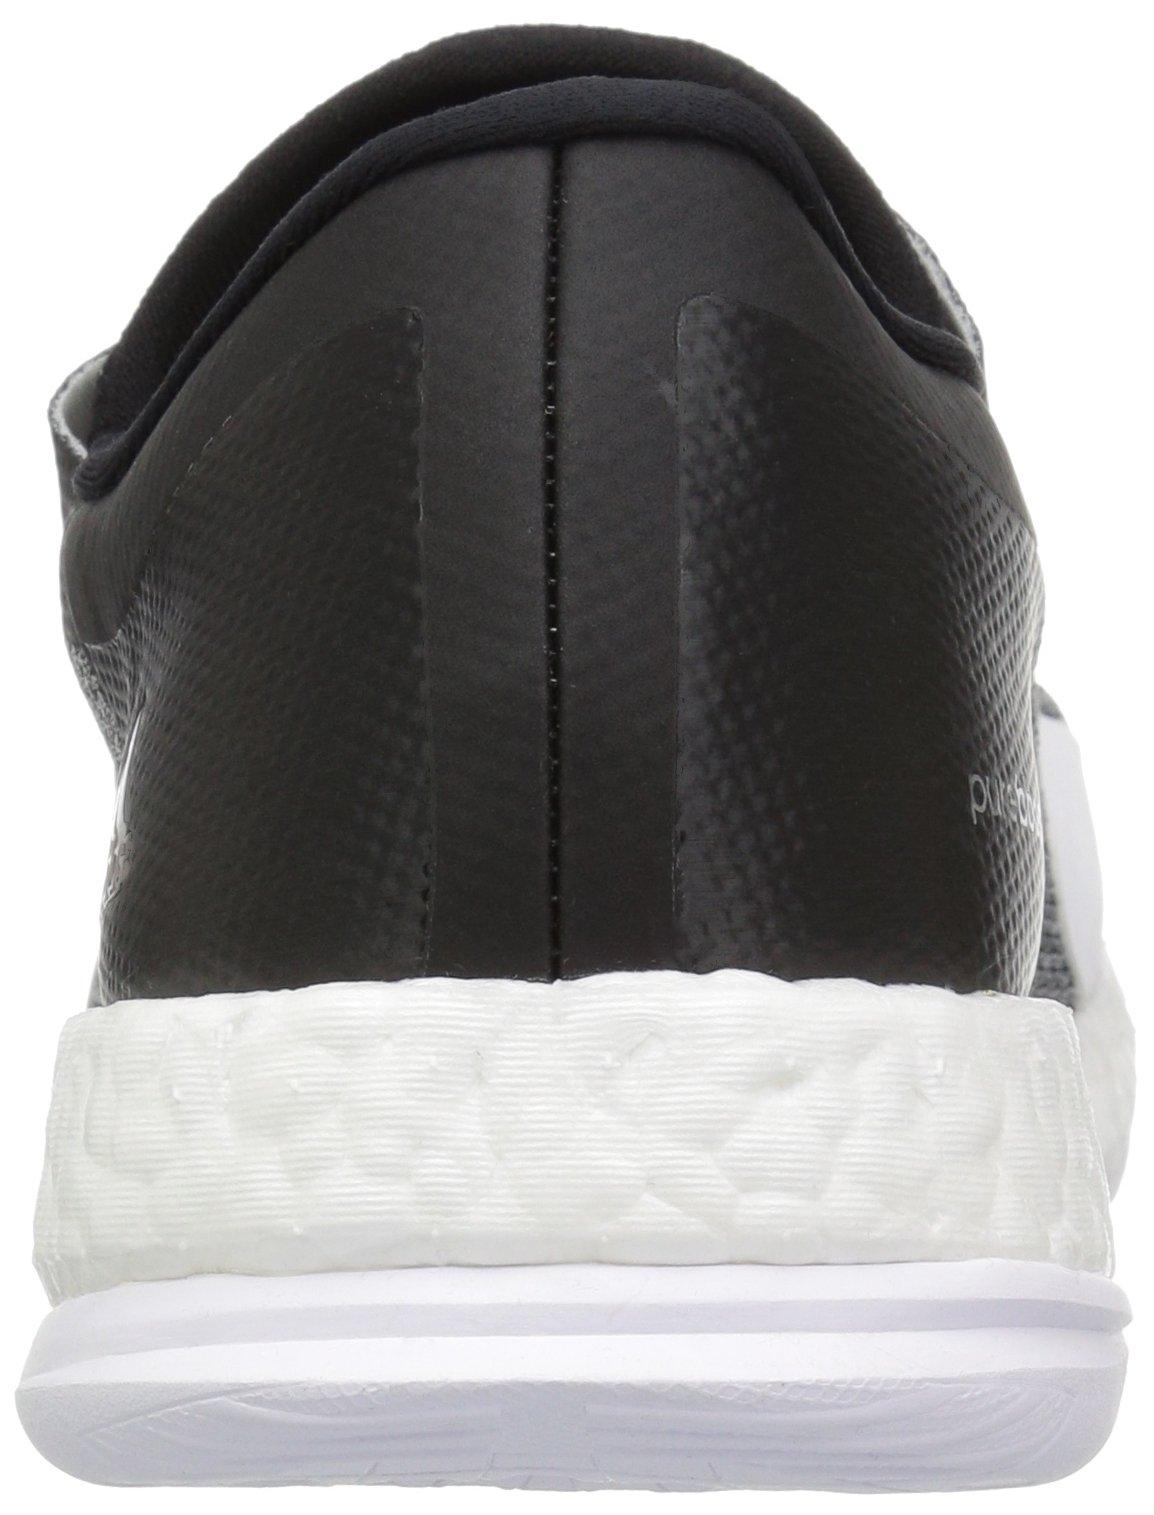 71DJs35aB6L - adidas Womens Pure Boost x tr Zip Low Top Slip On Fashion Sneakers